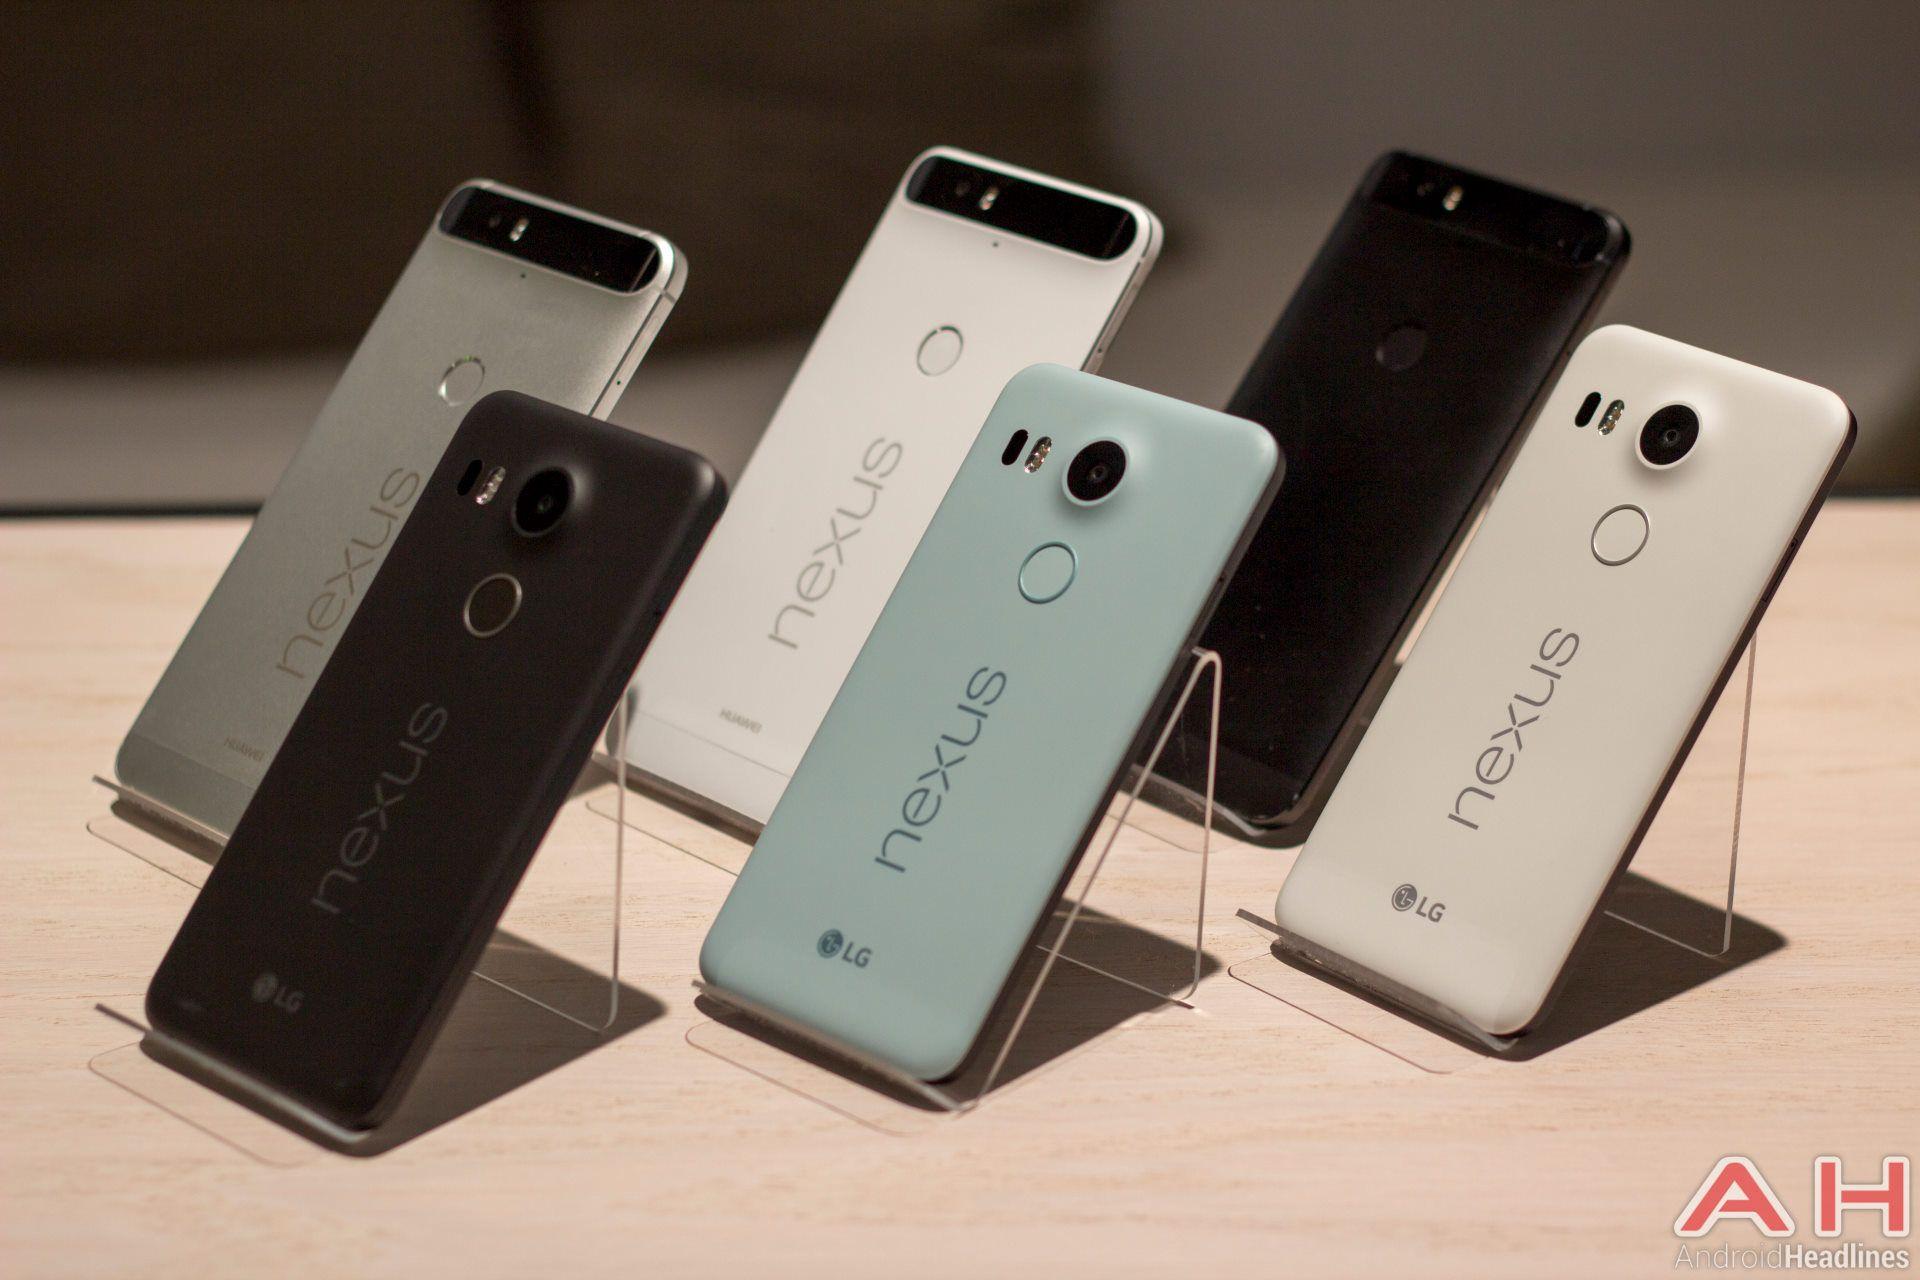 Google Says Nexus 5X/6P Use Faster SoftwareBased